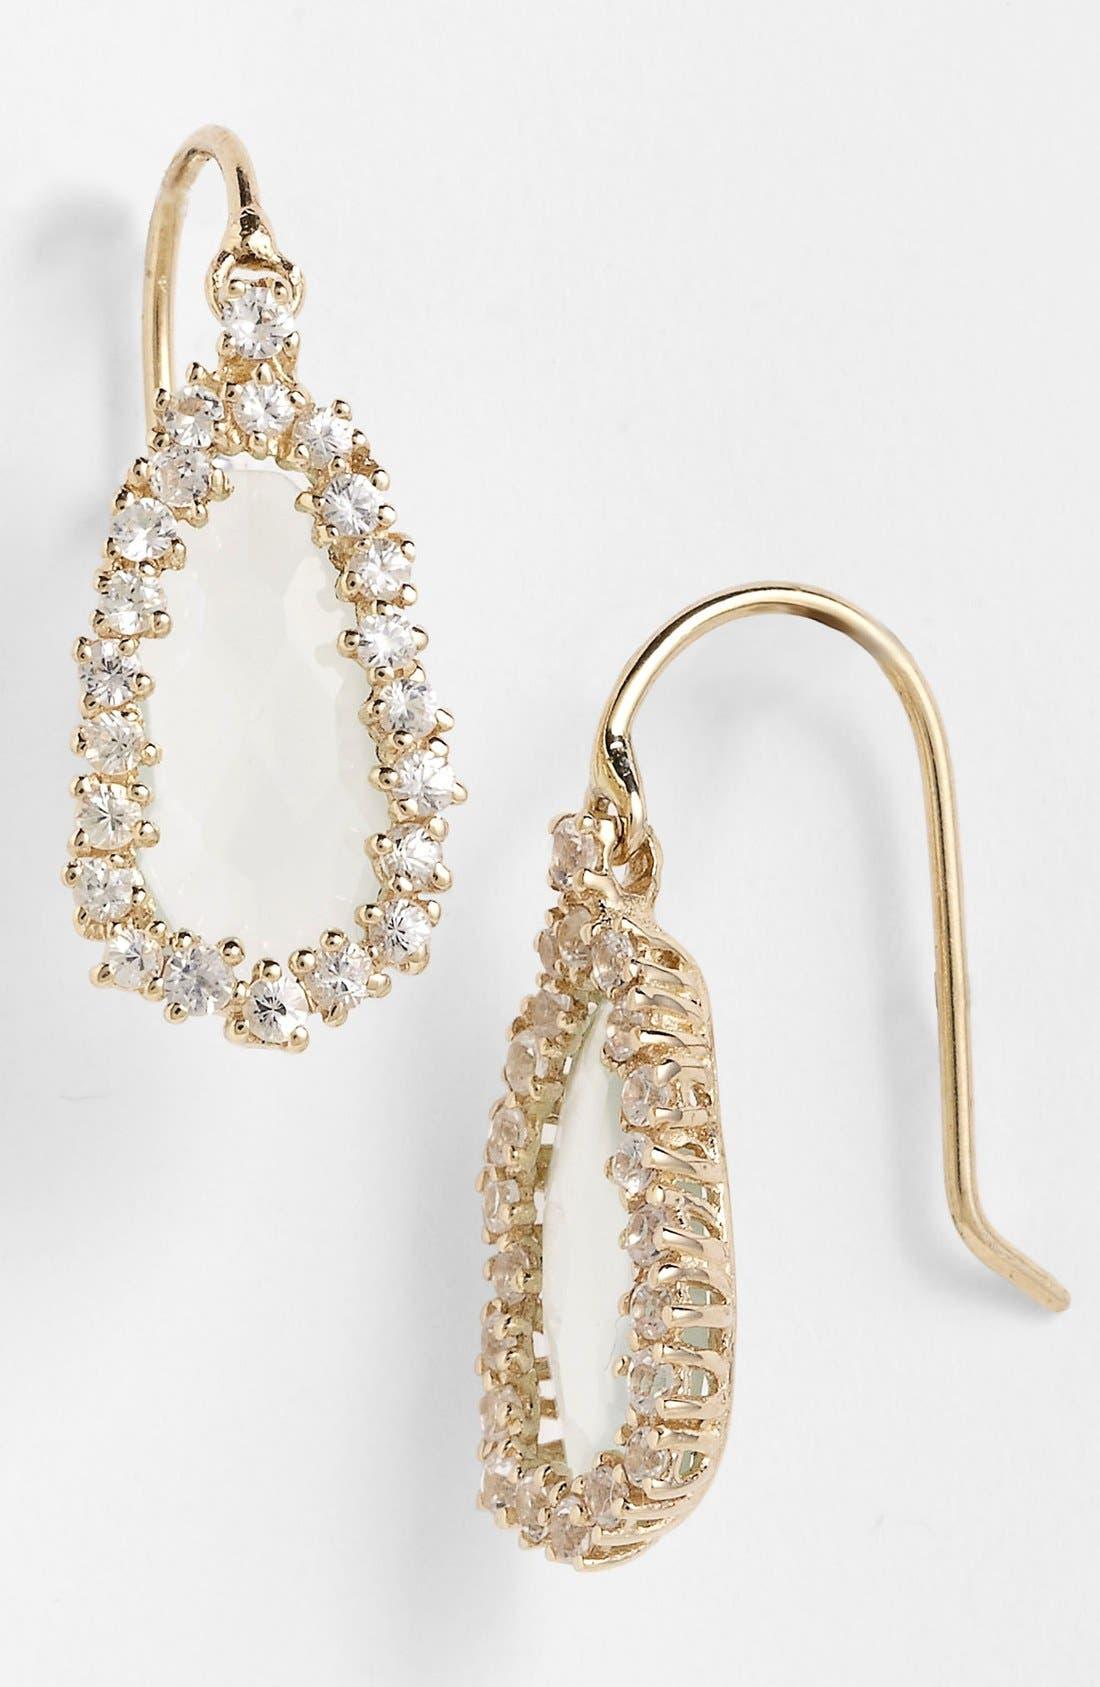 Alternate Image 1 Selected - KALAN by Suzanne Kalan Pear Shape Drop Earrings